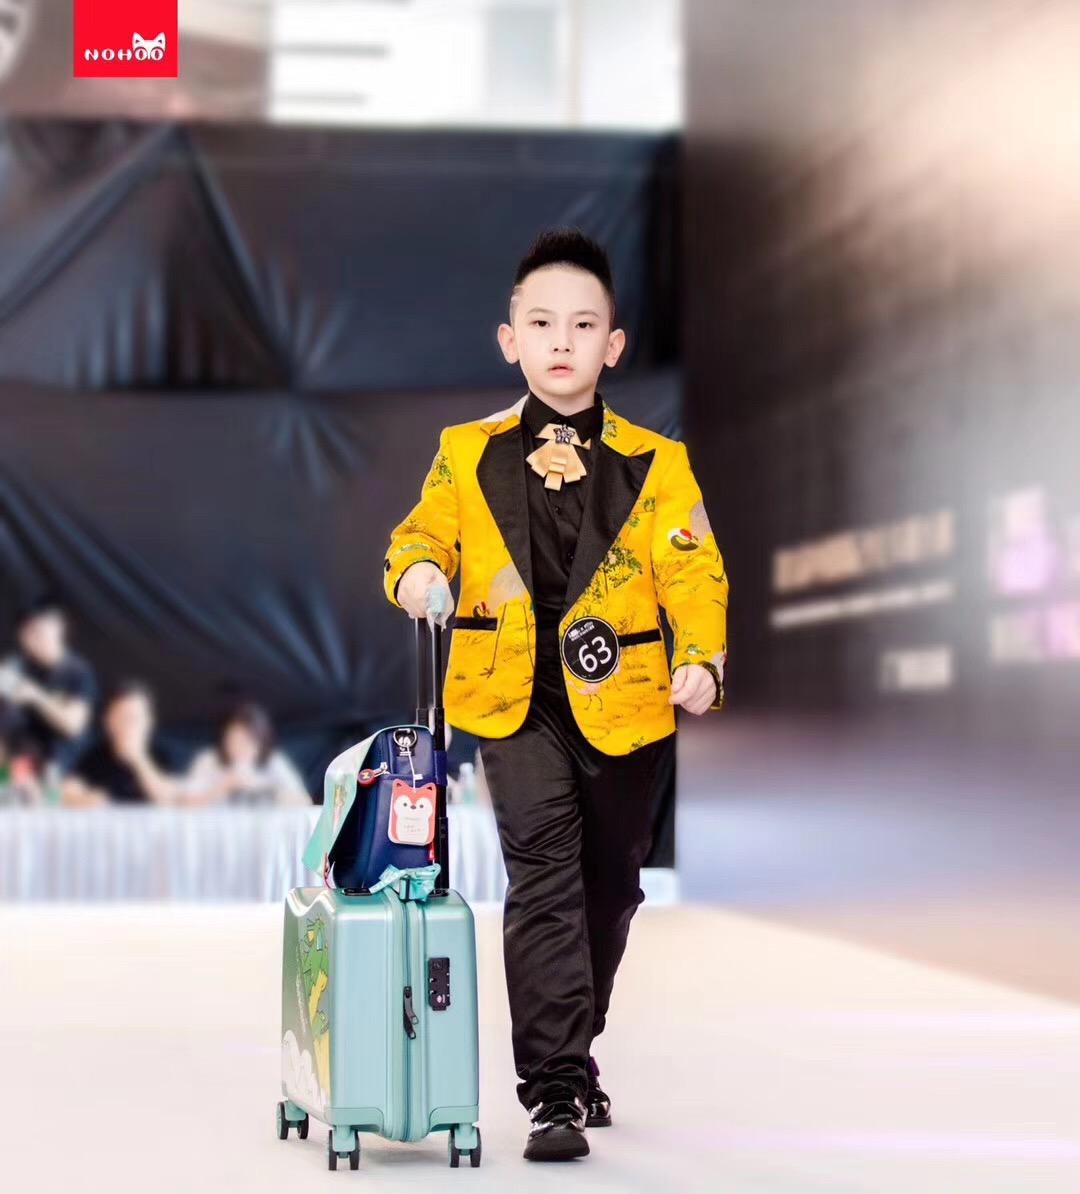 Nohoo Children Products-Nohoo Children School Bag Sponsors The China International Childrens Car-4